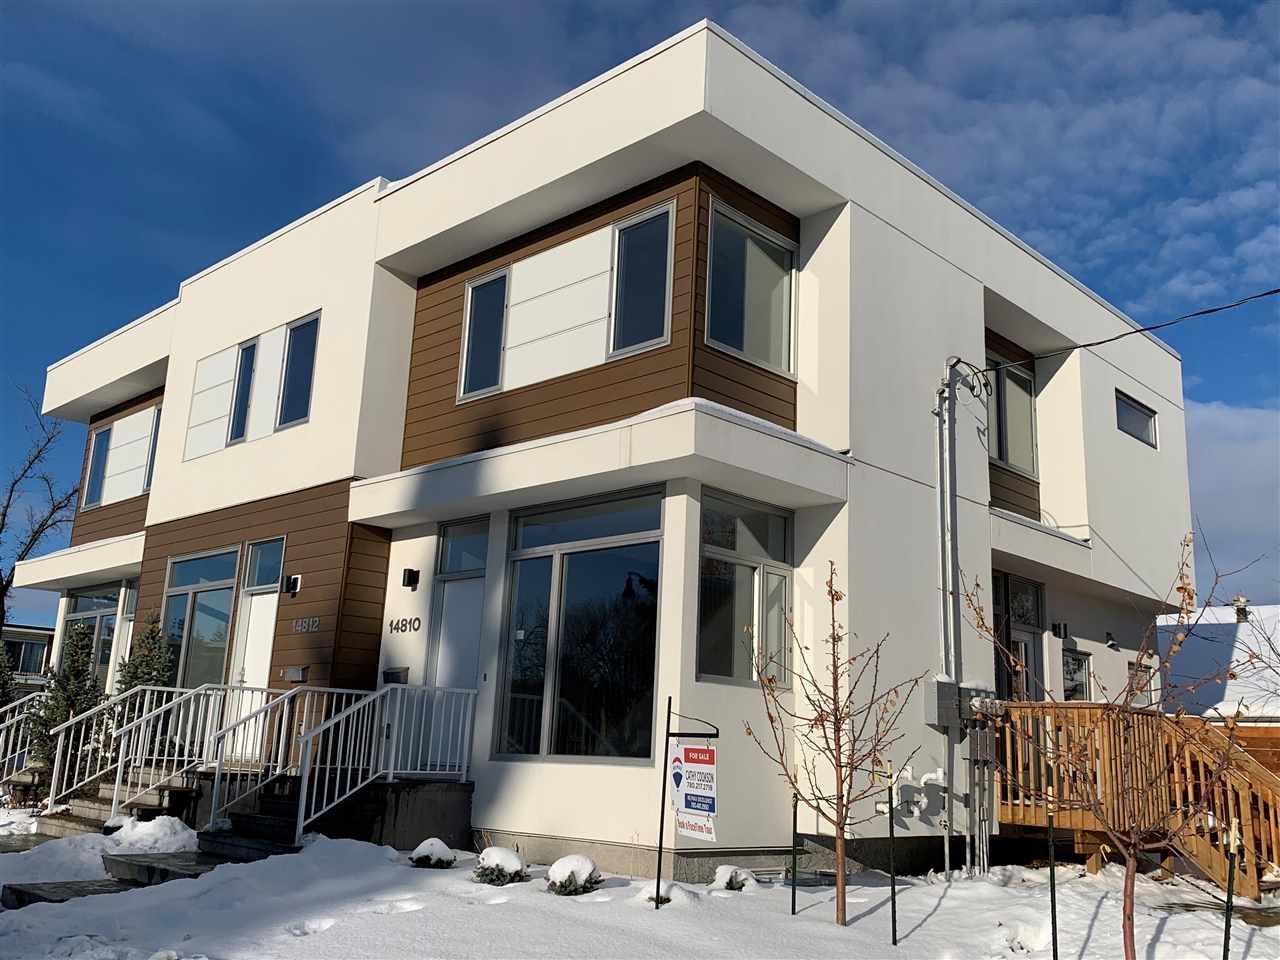 Main Photo: 14810 98 Avenue in Edmonton: Zone 10 Townhouse for sale : MLS®# E4221536